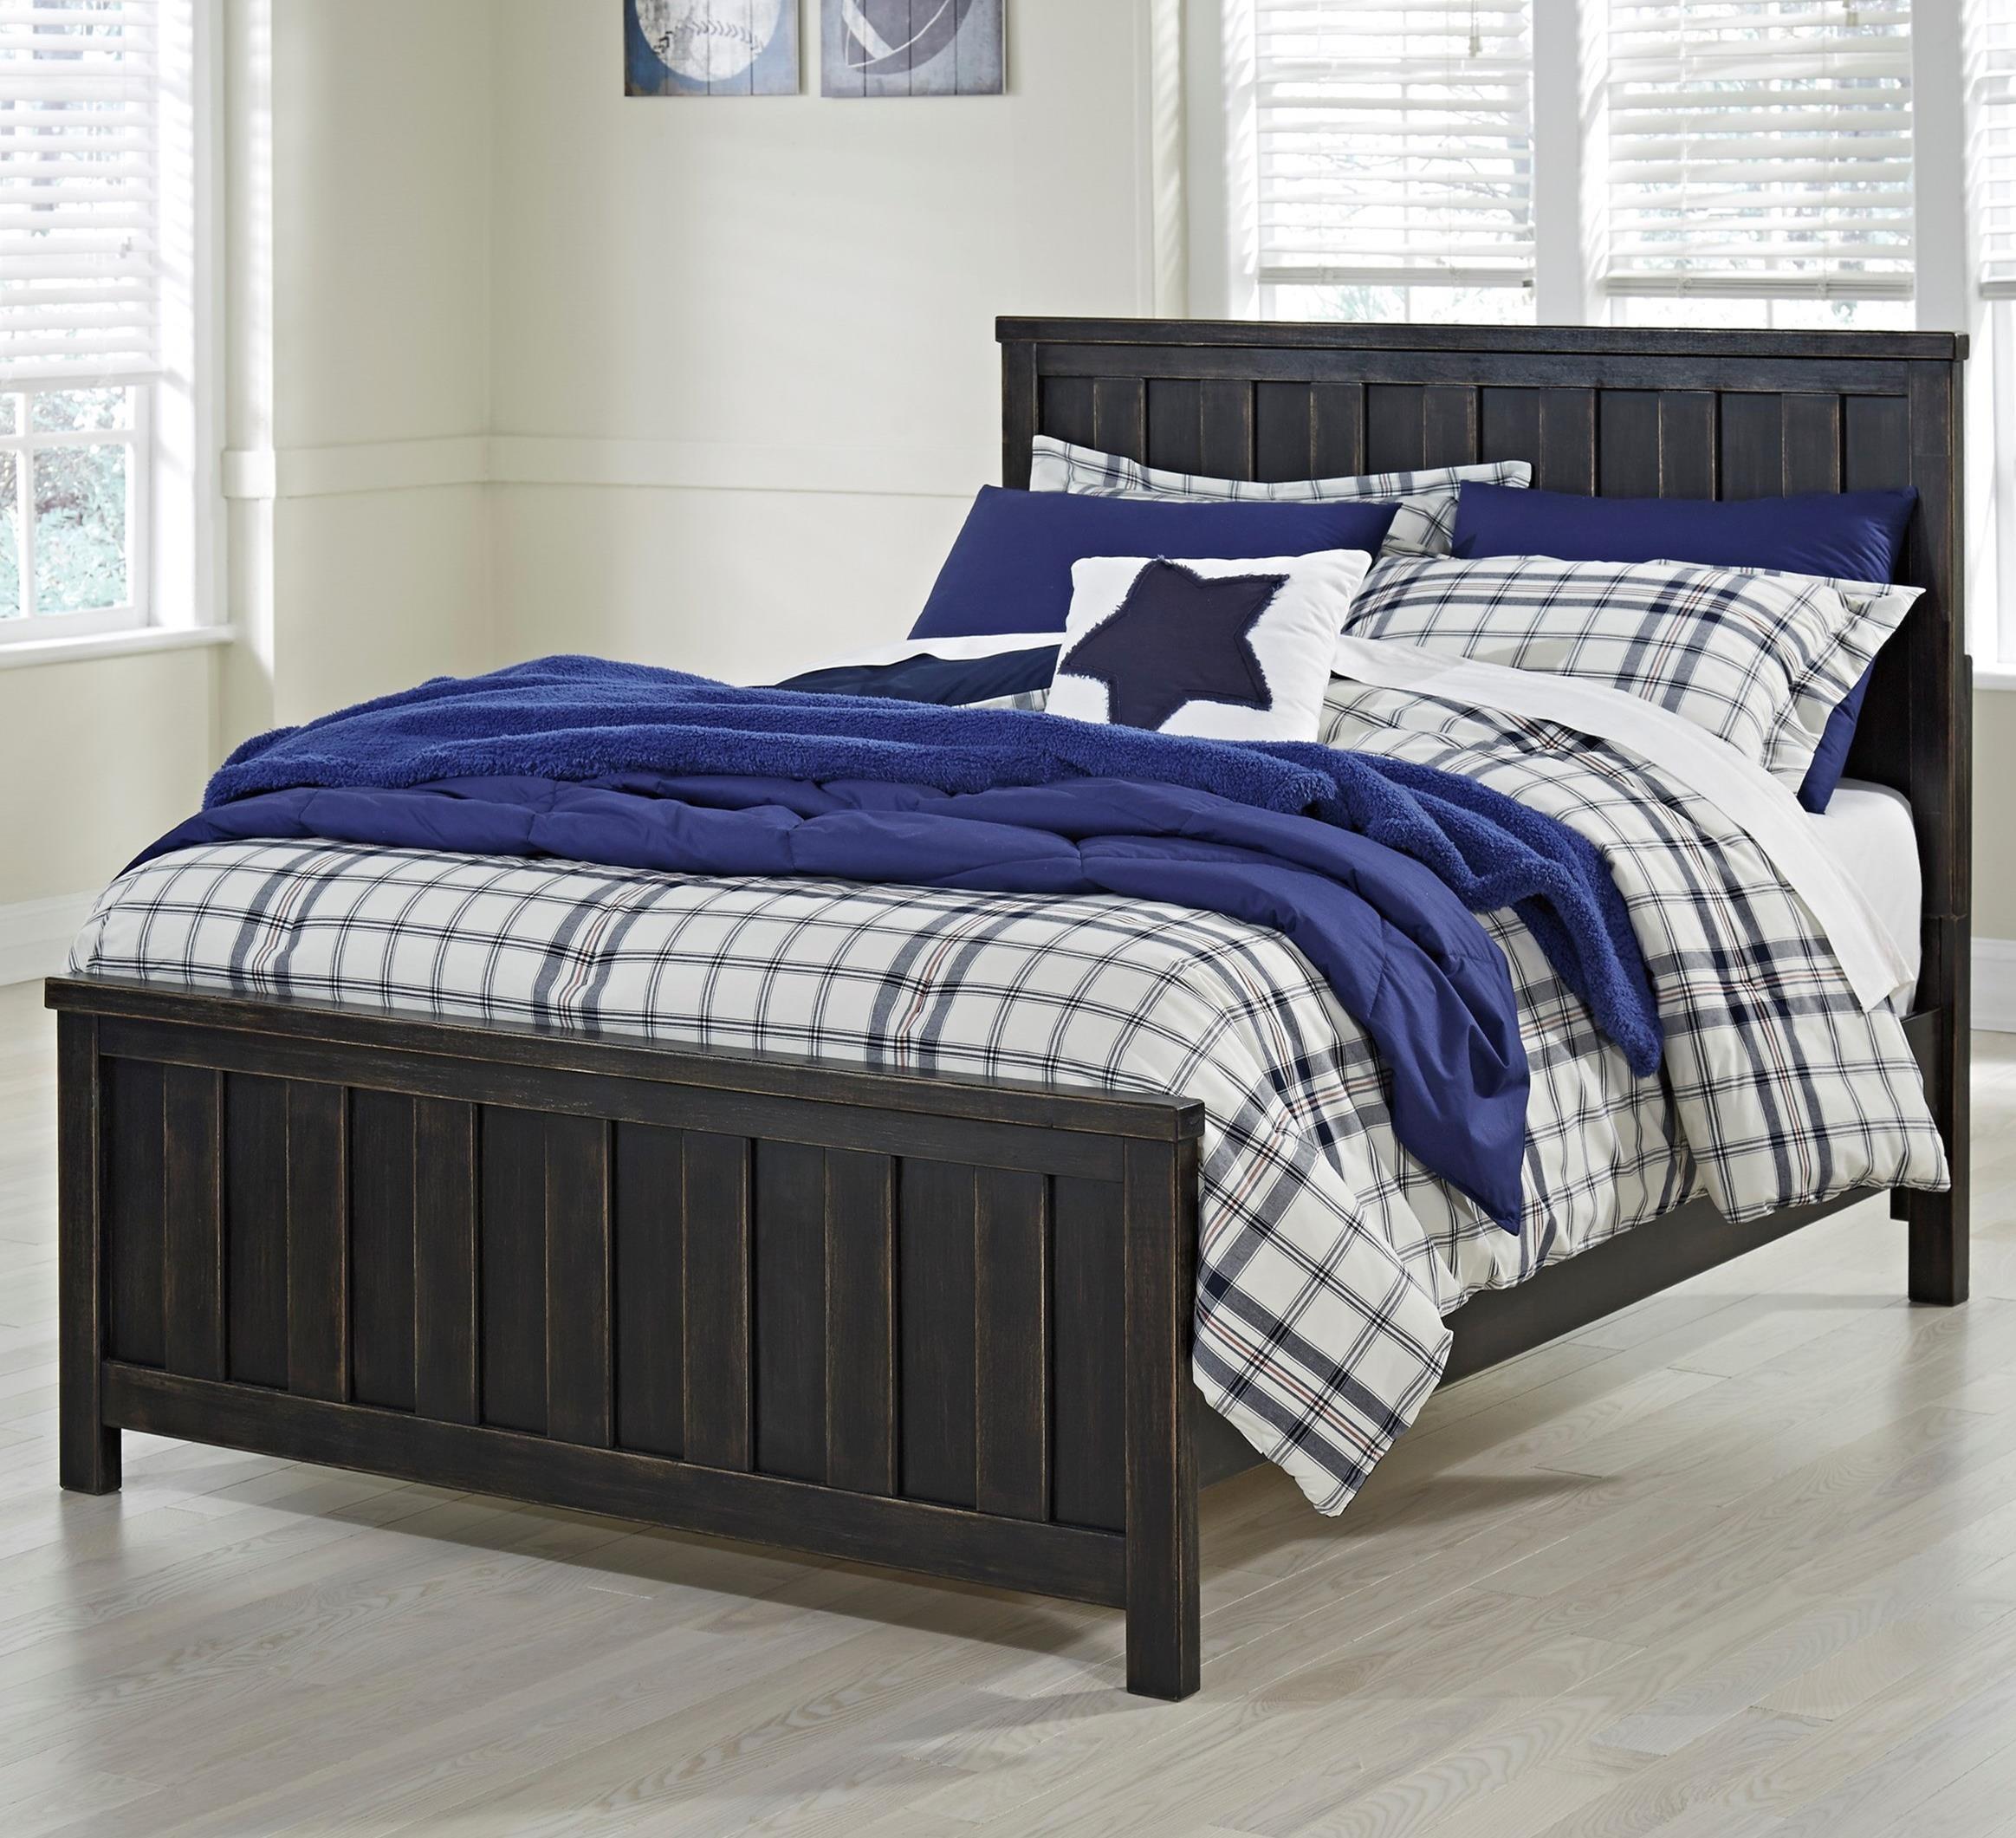 Ashley Signature Design Jaysom Full Panel Bed In Rub Through Black Finish Dunk Bright